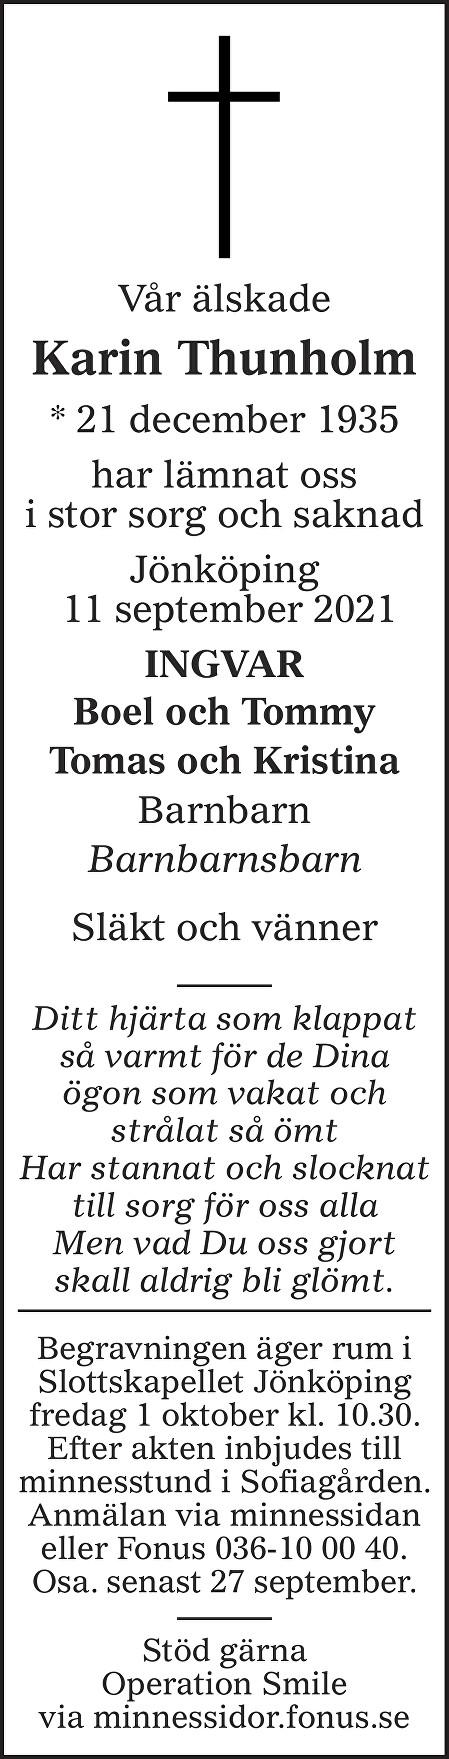 Karin Thunholm Death notice